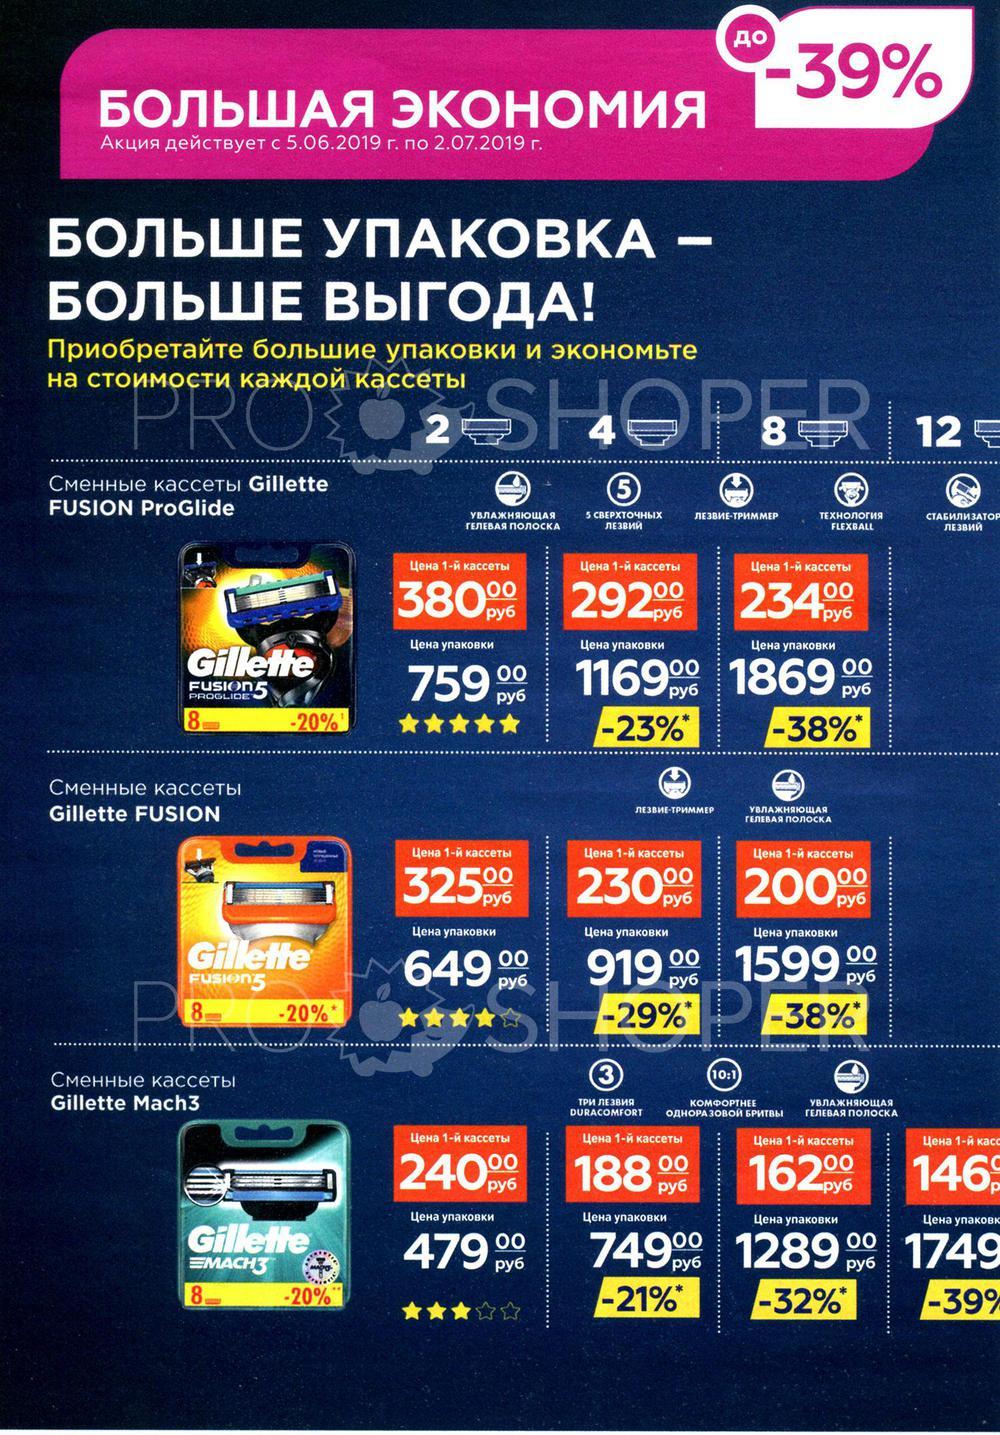 Акции в Магните Косметик с 5 июня по 2 июля 2019 года